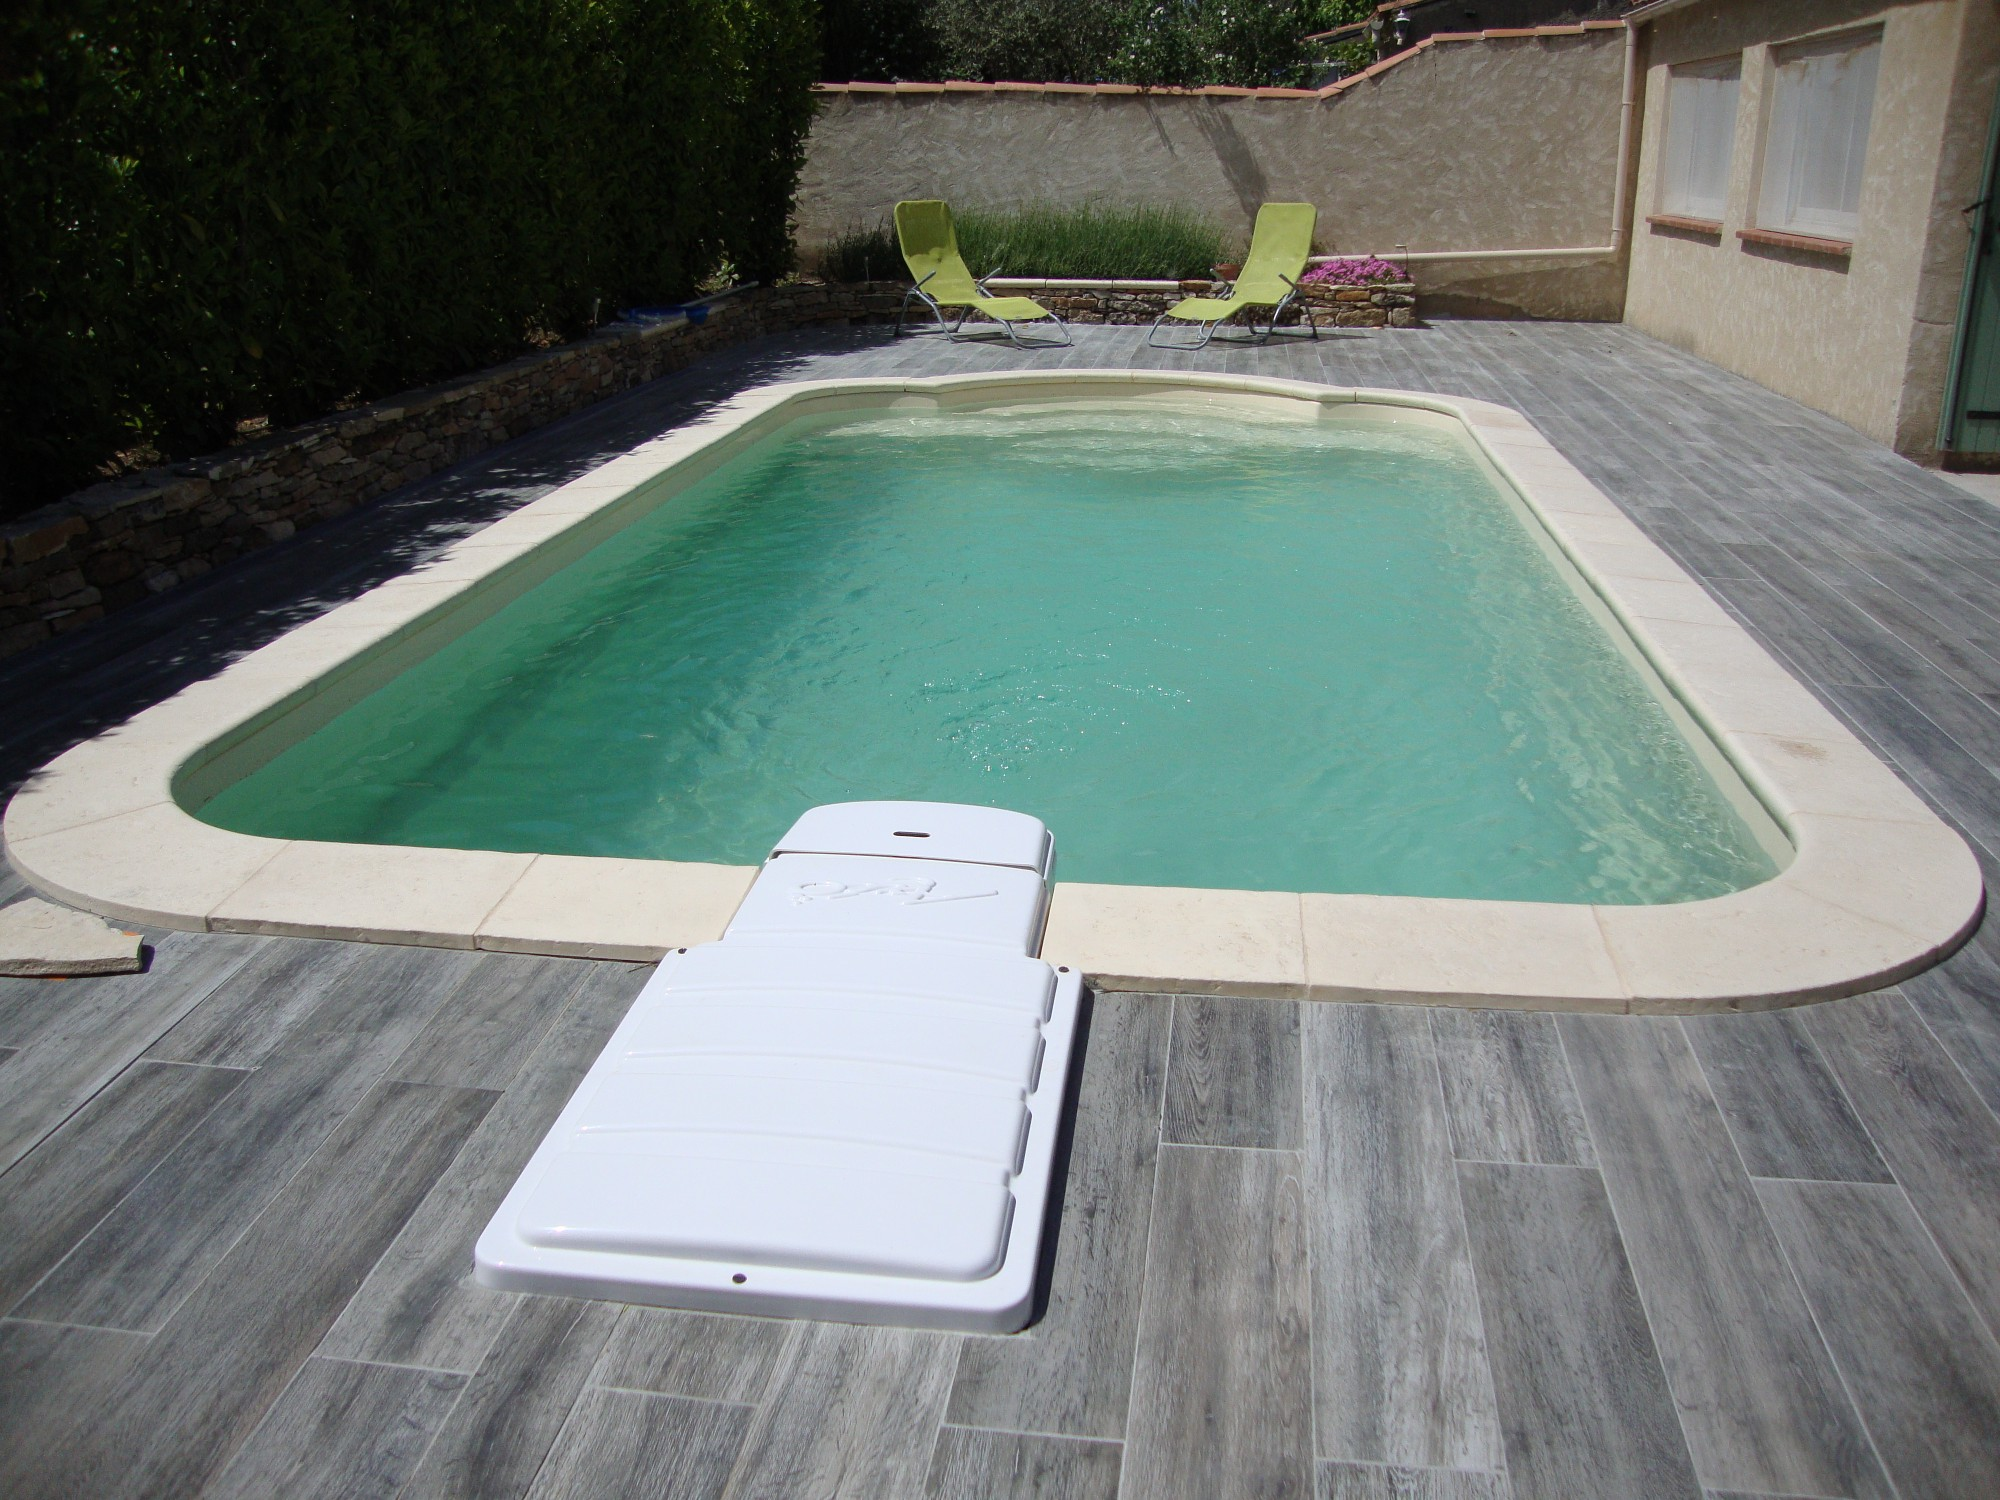 Piscine polyester rectangulaire avec escalier roman 730ft nos piscines constructeur de piscine - Piscine miroir prix fort de france ...